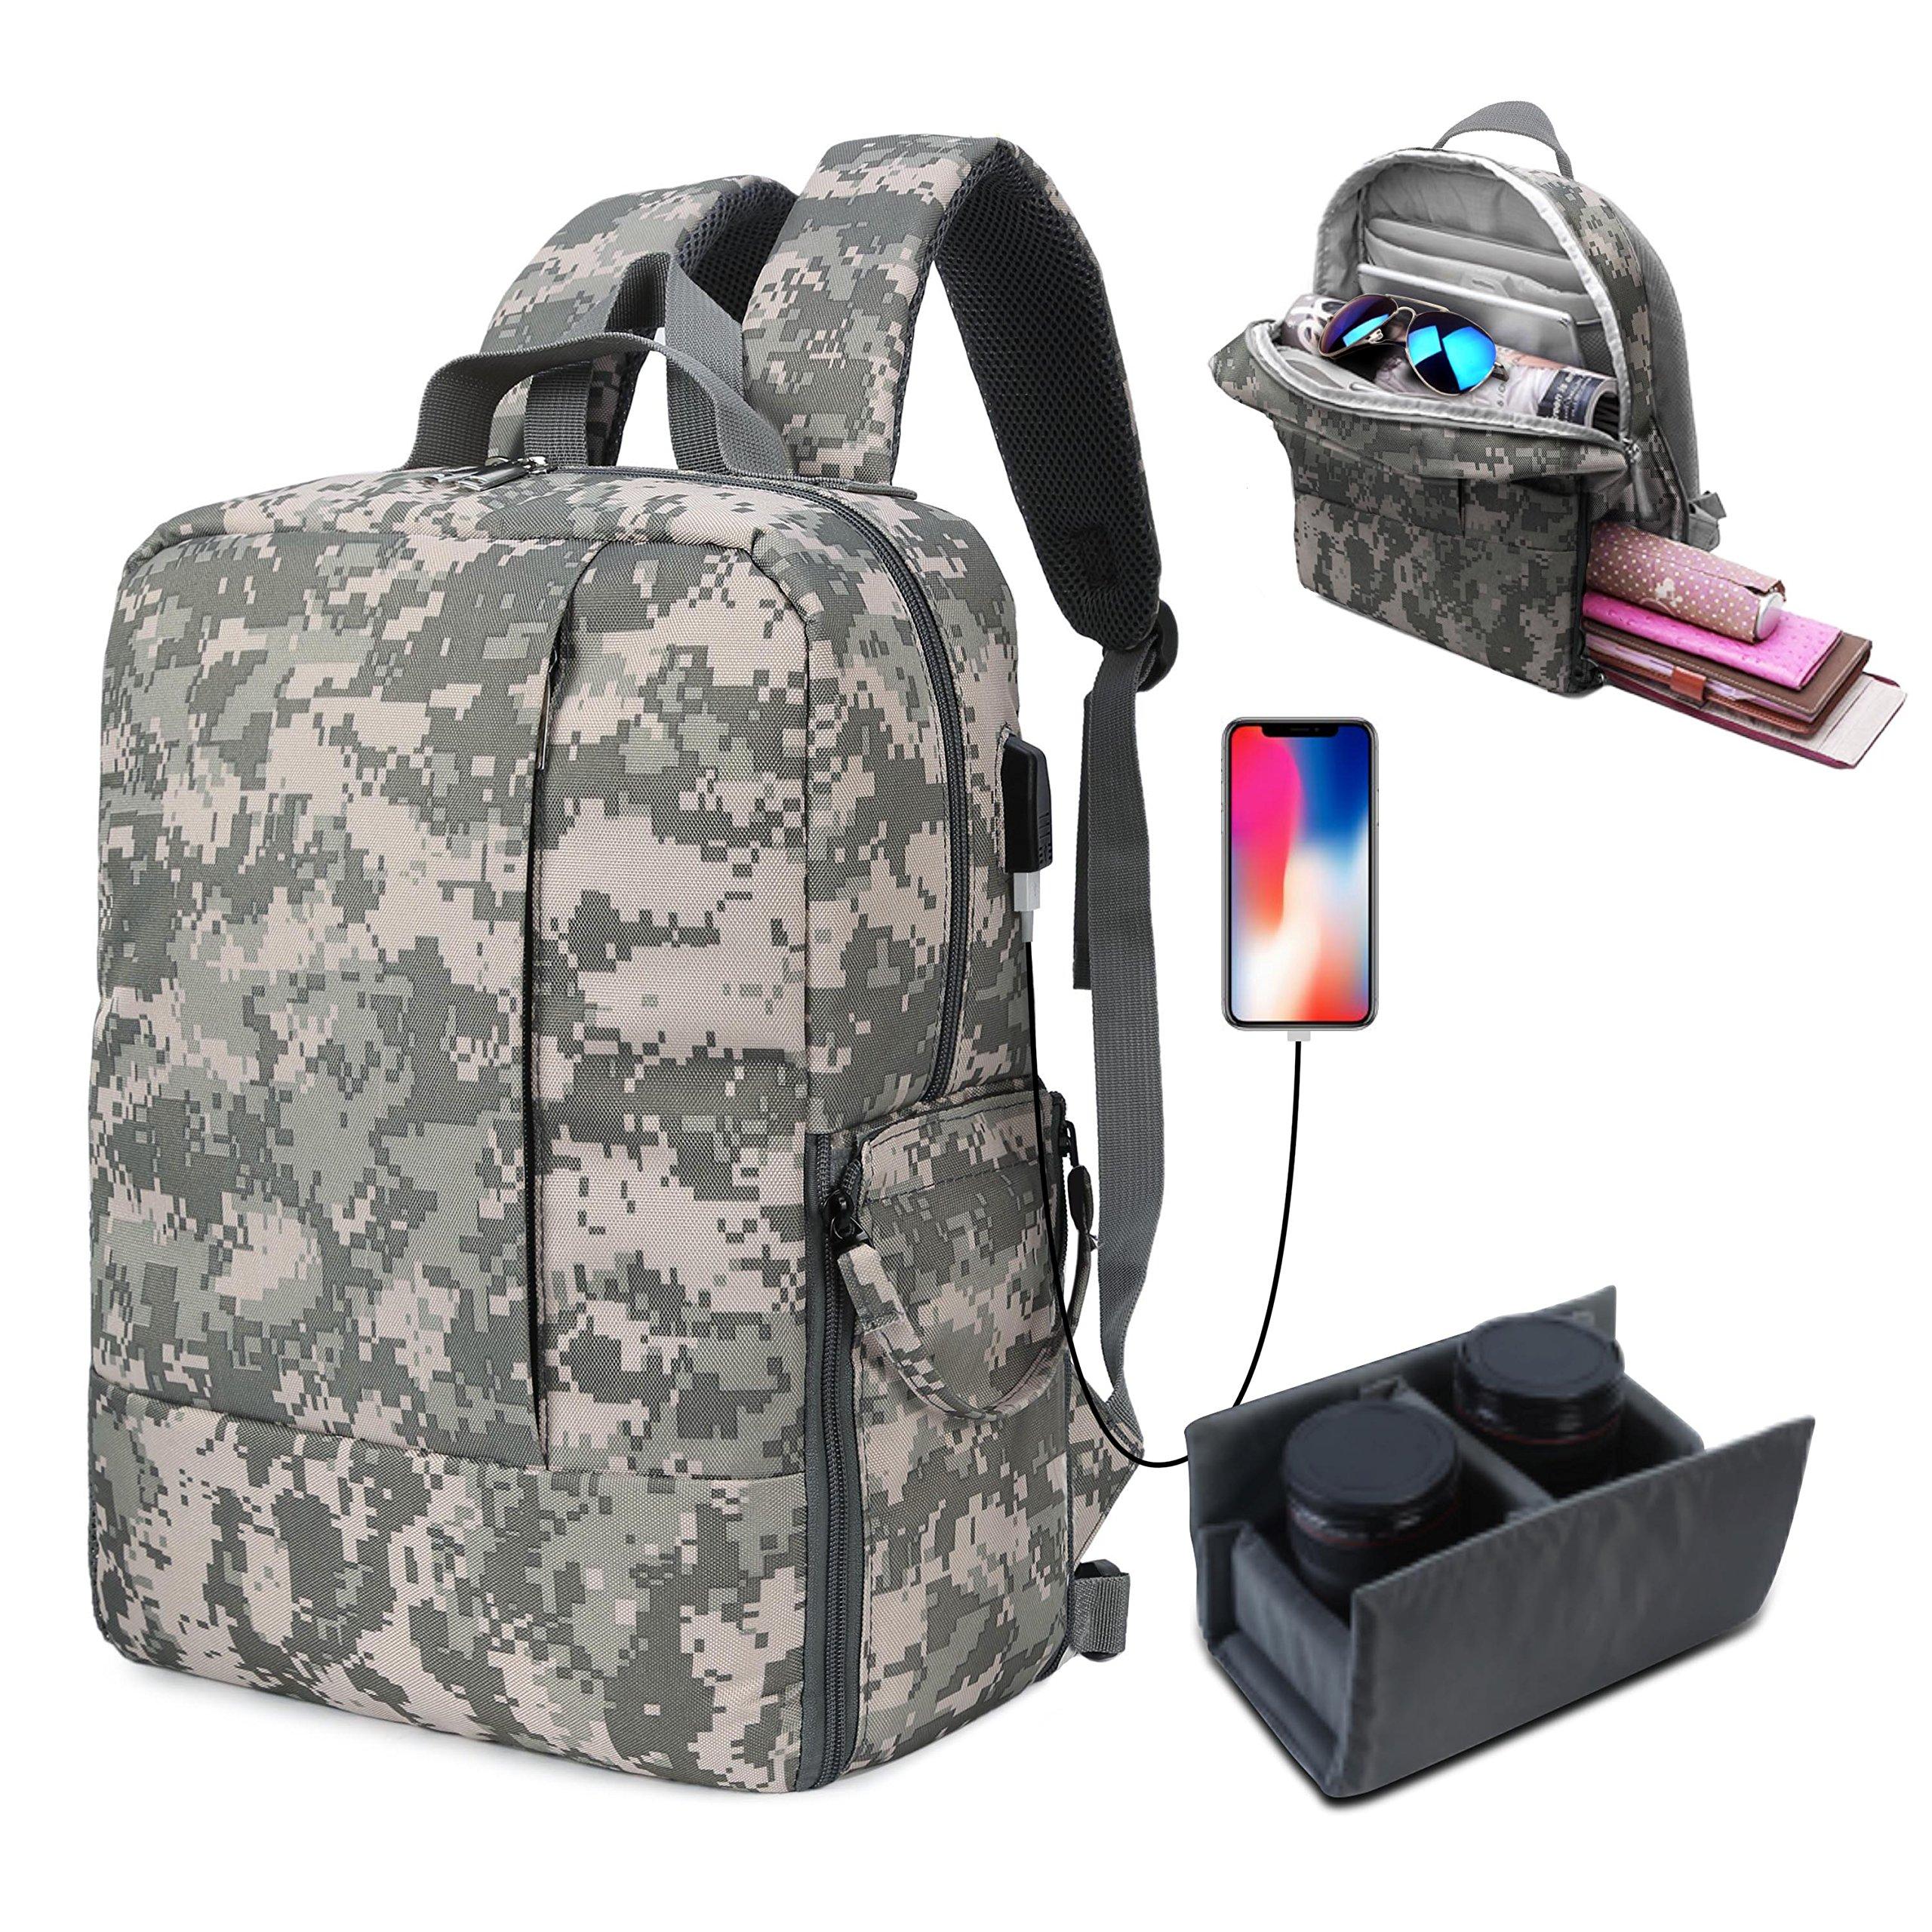 DSLR SLR Camera Backpack for Women Men Waterproof Camera Bag with Laptop for Canon Nikon Sony (Dark Gray)